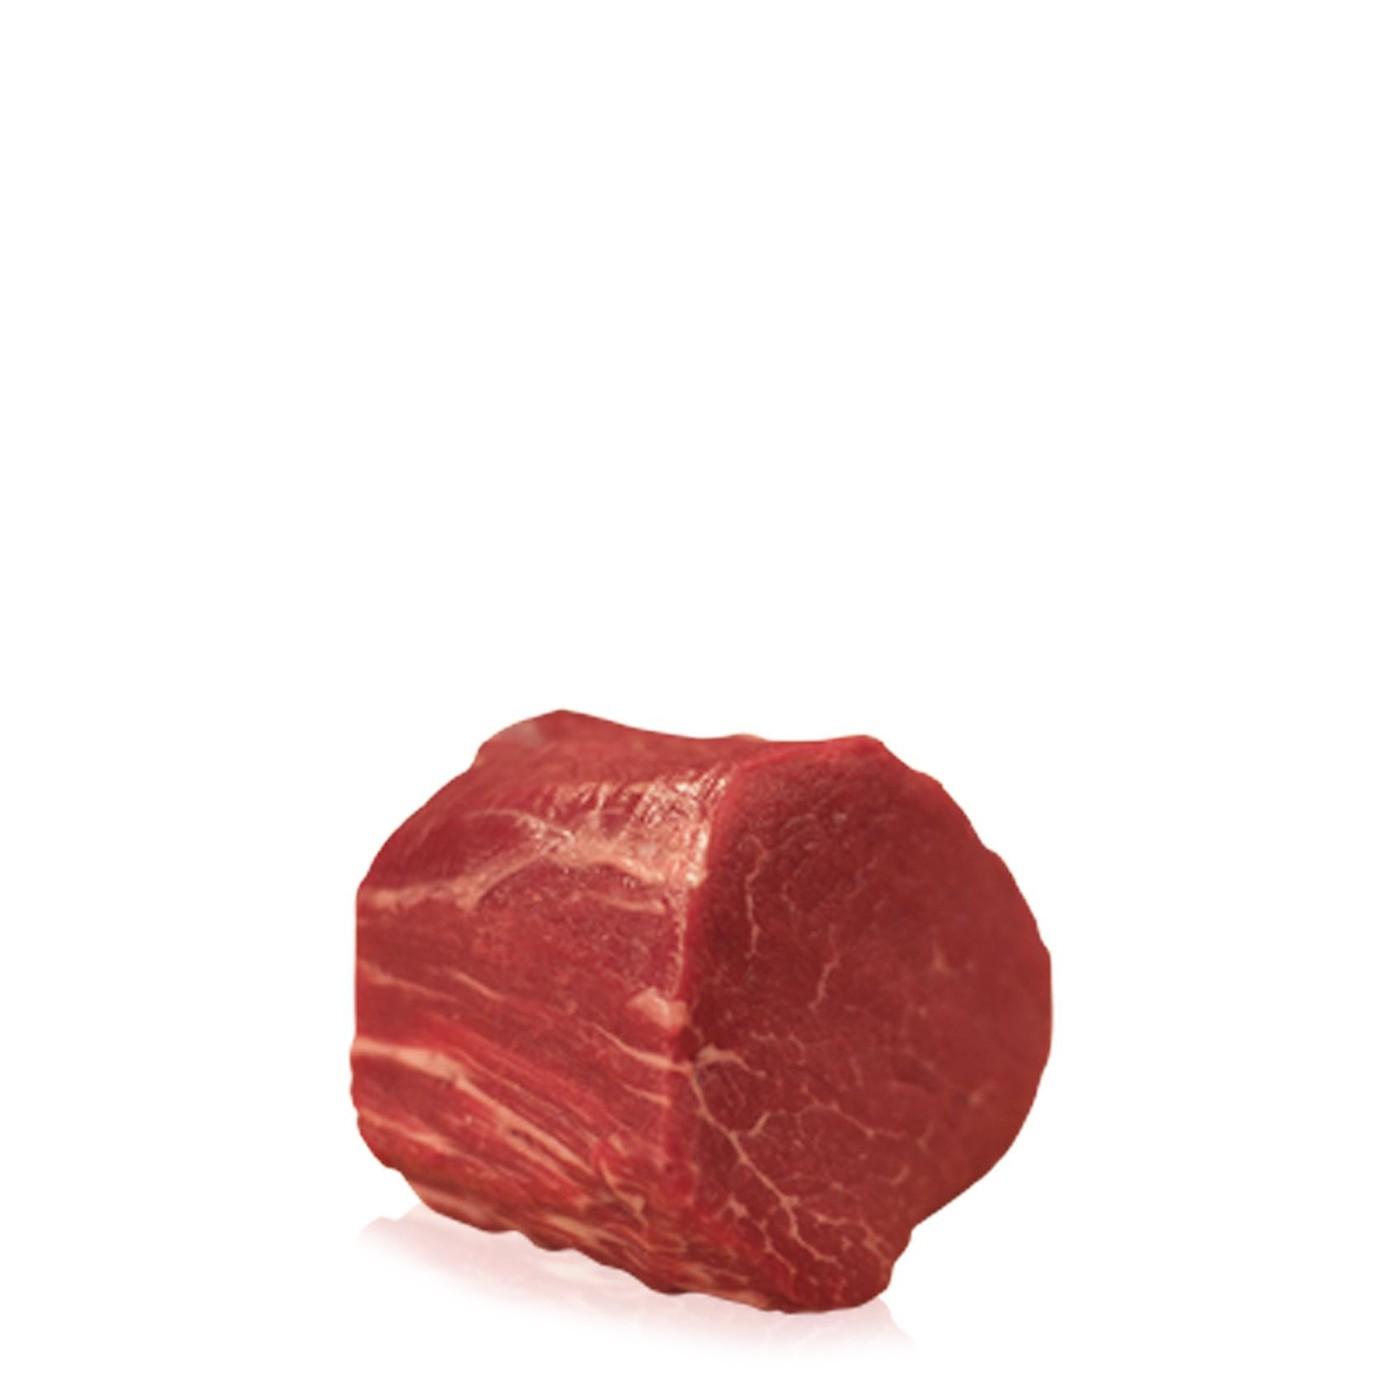 Prime Black Angus Beef Filet Mignon 4 Steaks, 8 oz each